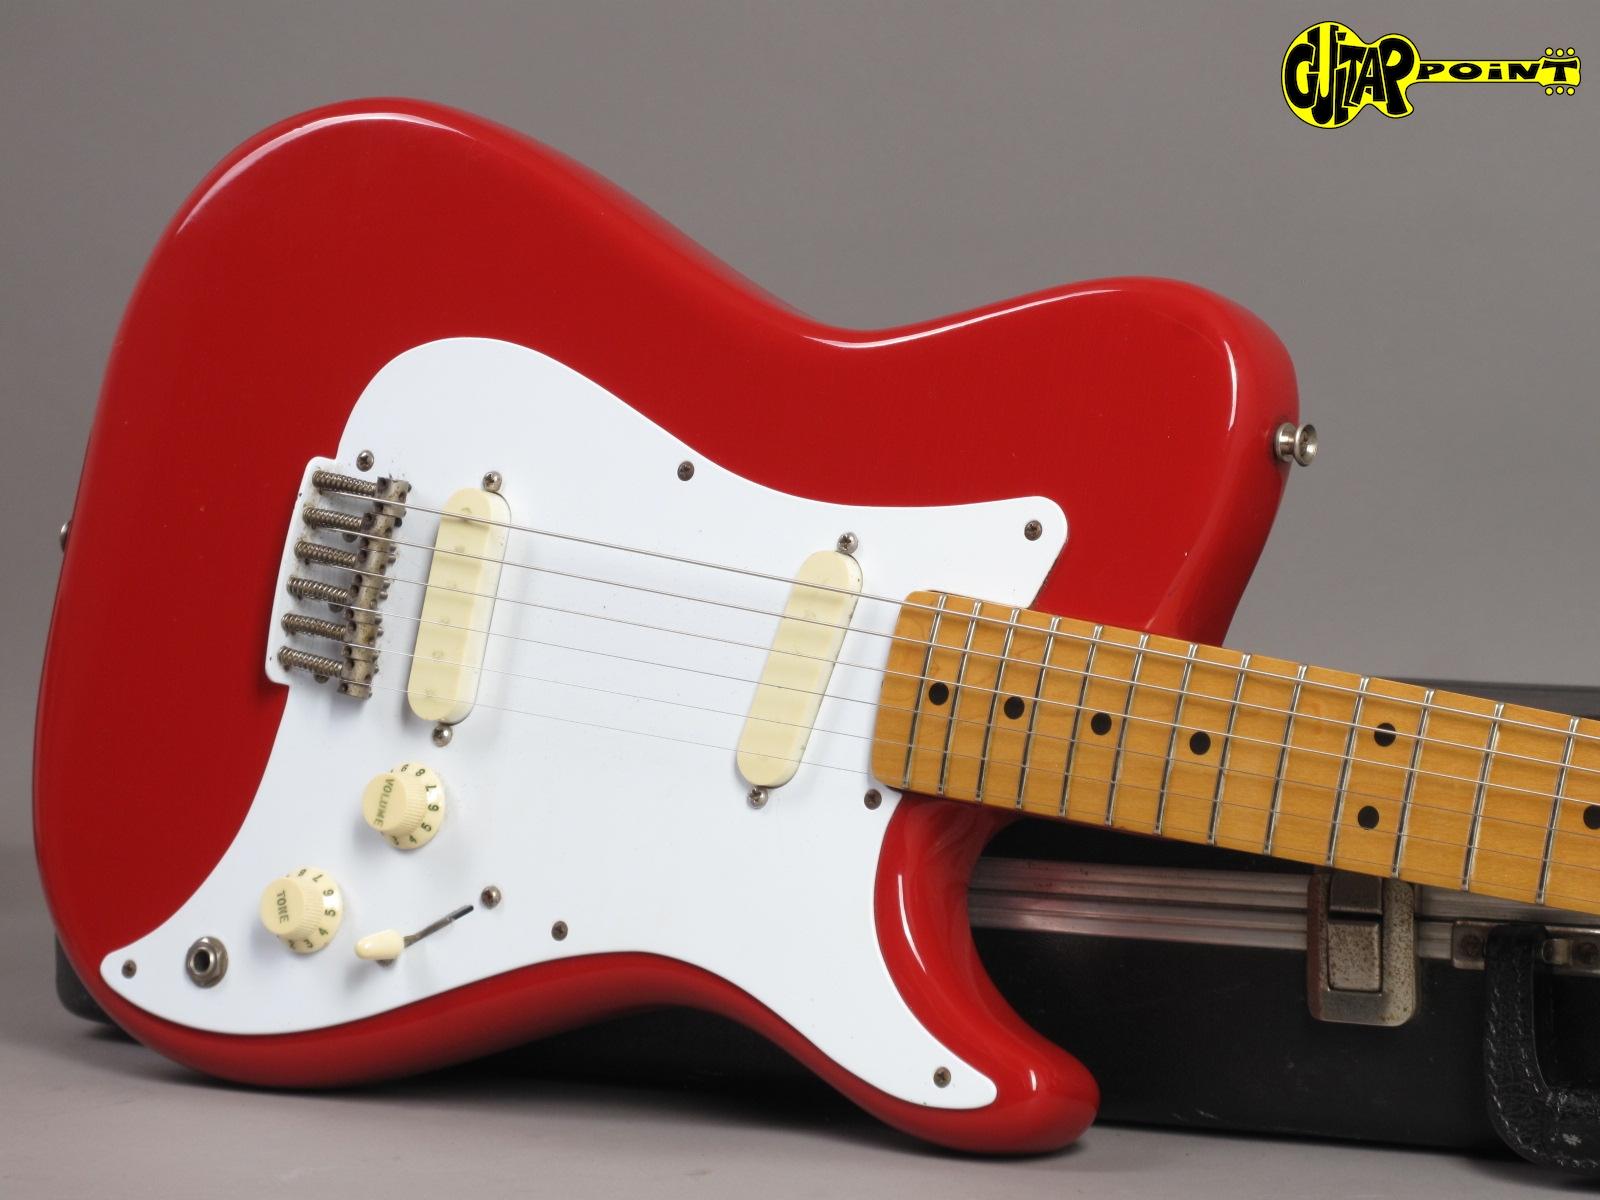 https://guitarpoint.de/app/uploads/products/1981-fender-bullet-red-made-in-usa/Fender81BulletRed_E111304_19.jpg